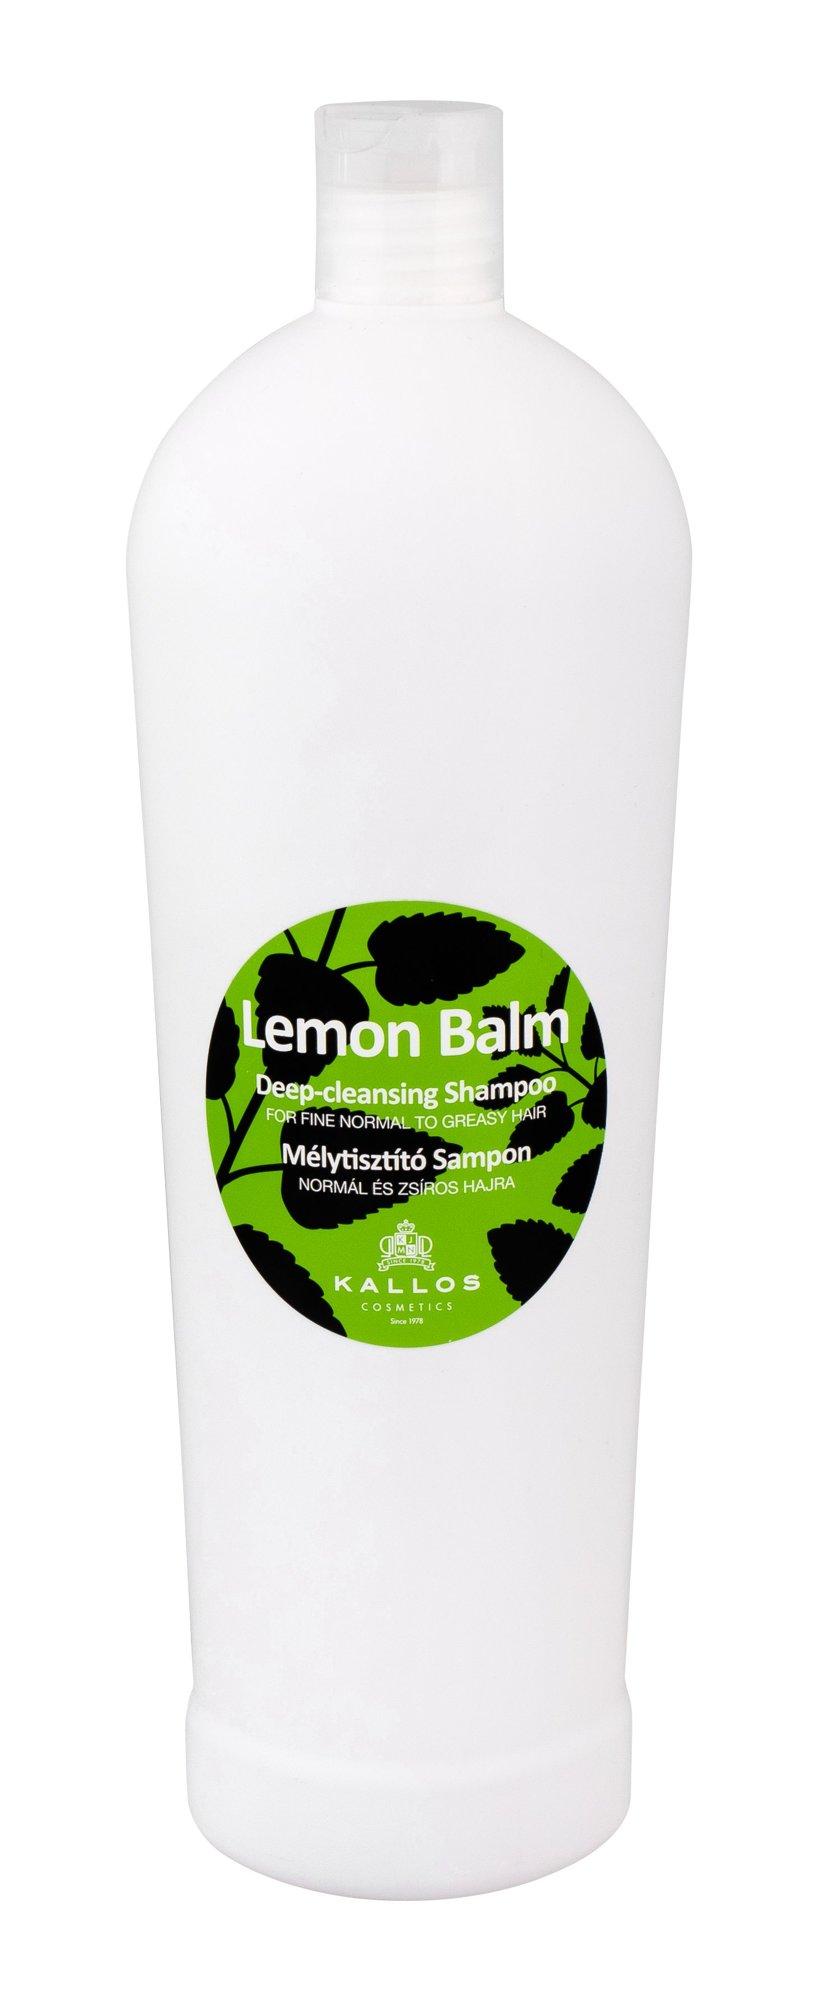 Kallos Cosmetics Lemon Balm